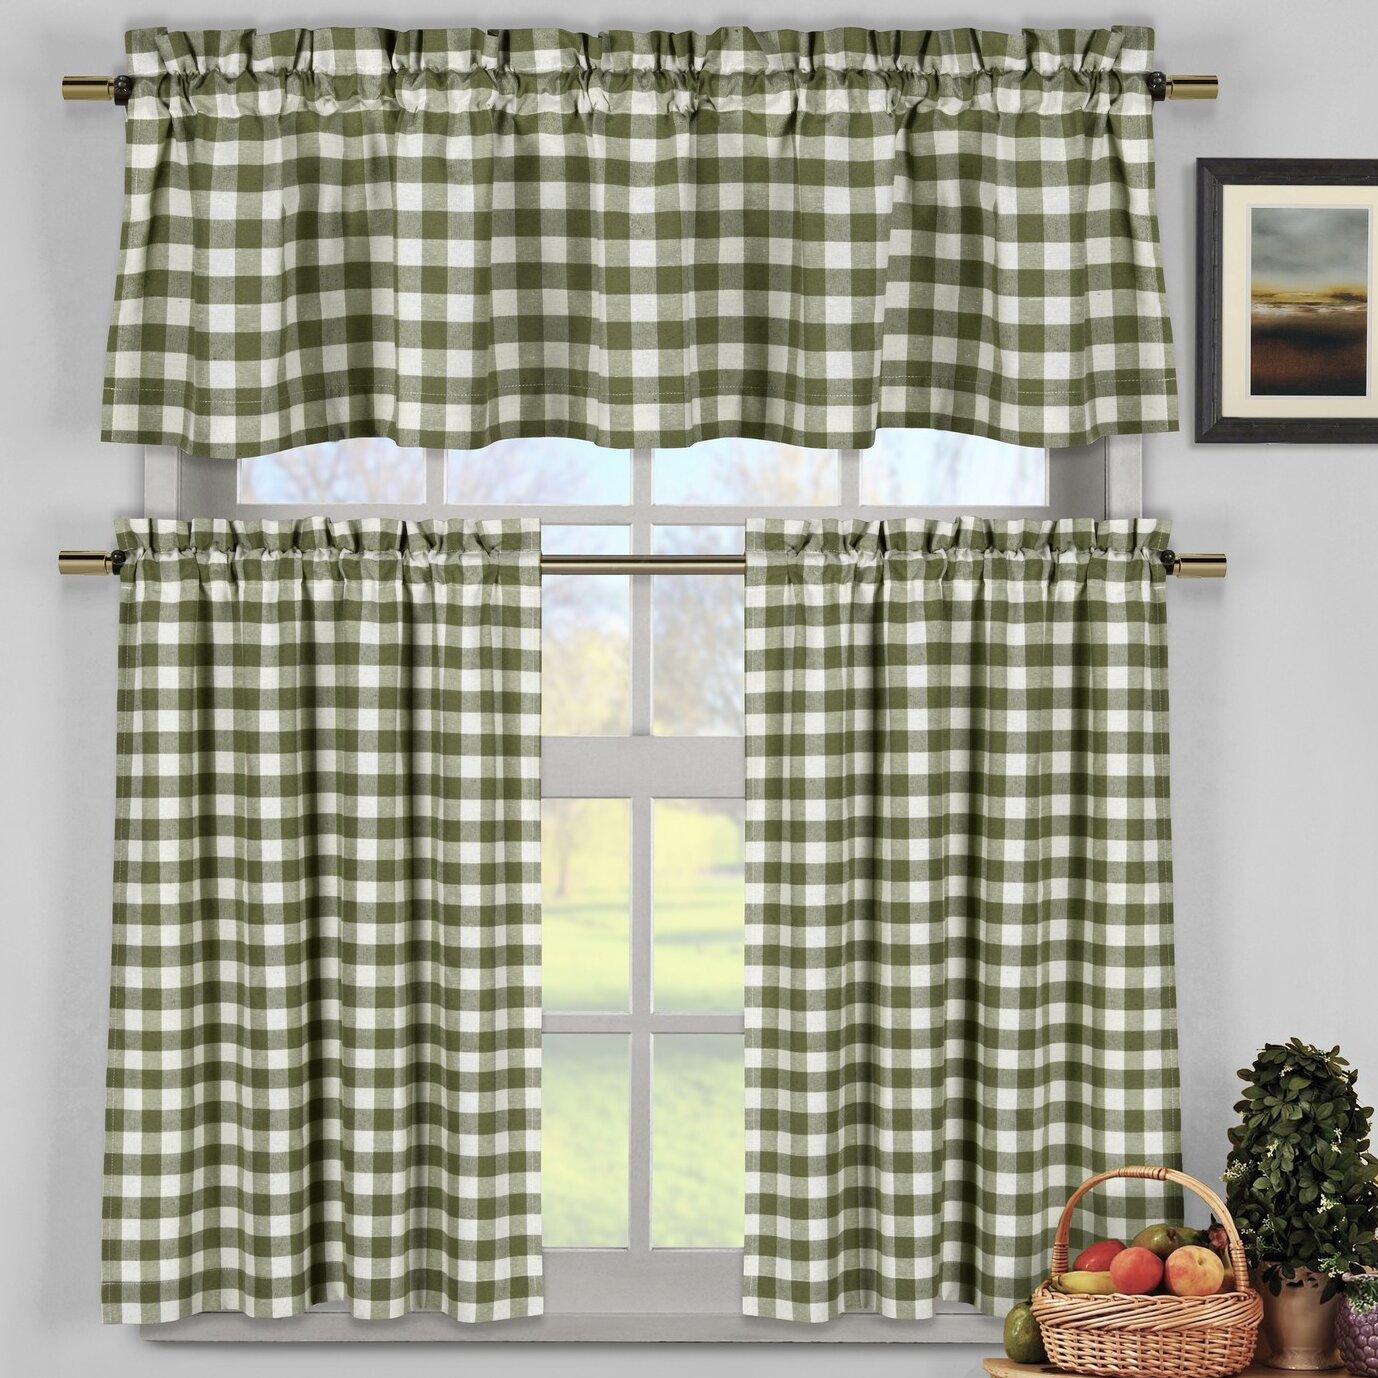 Loon Peak Guyette 3 Piece Kitchen Curtain Set Reviews